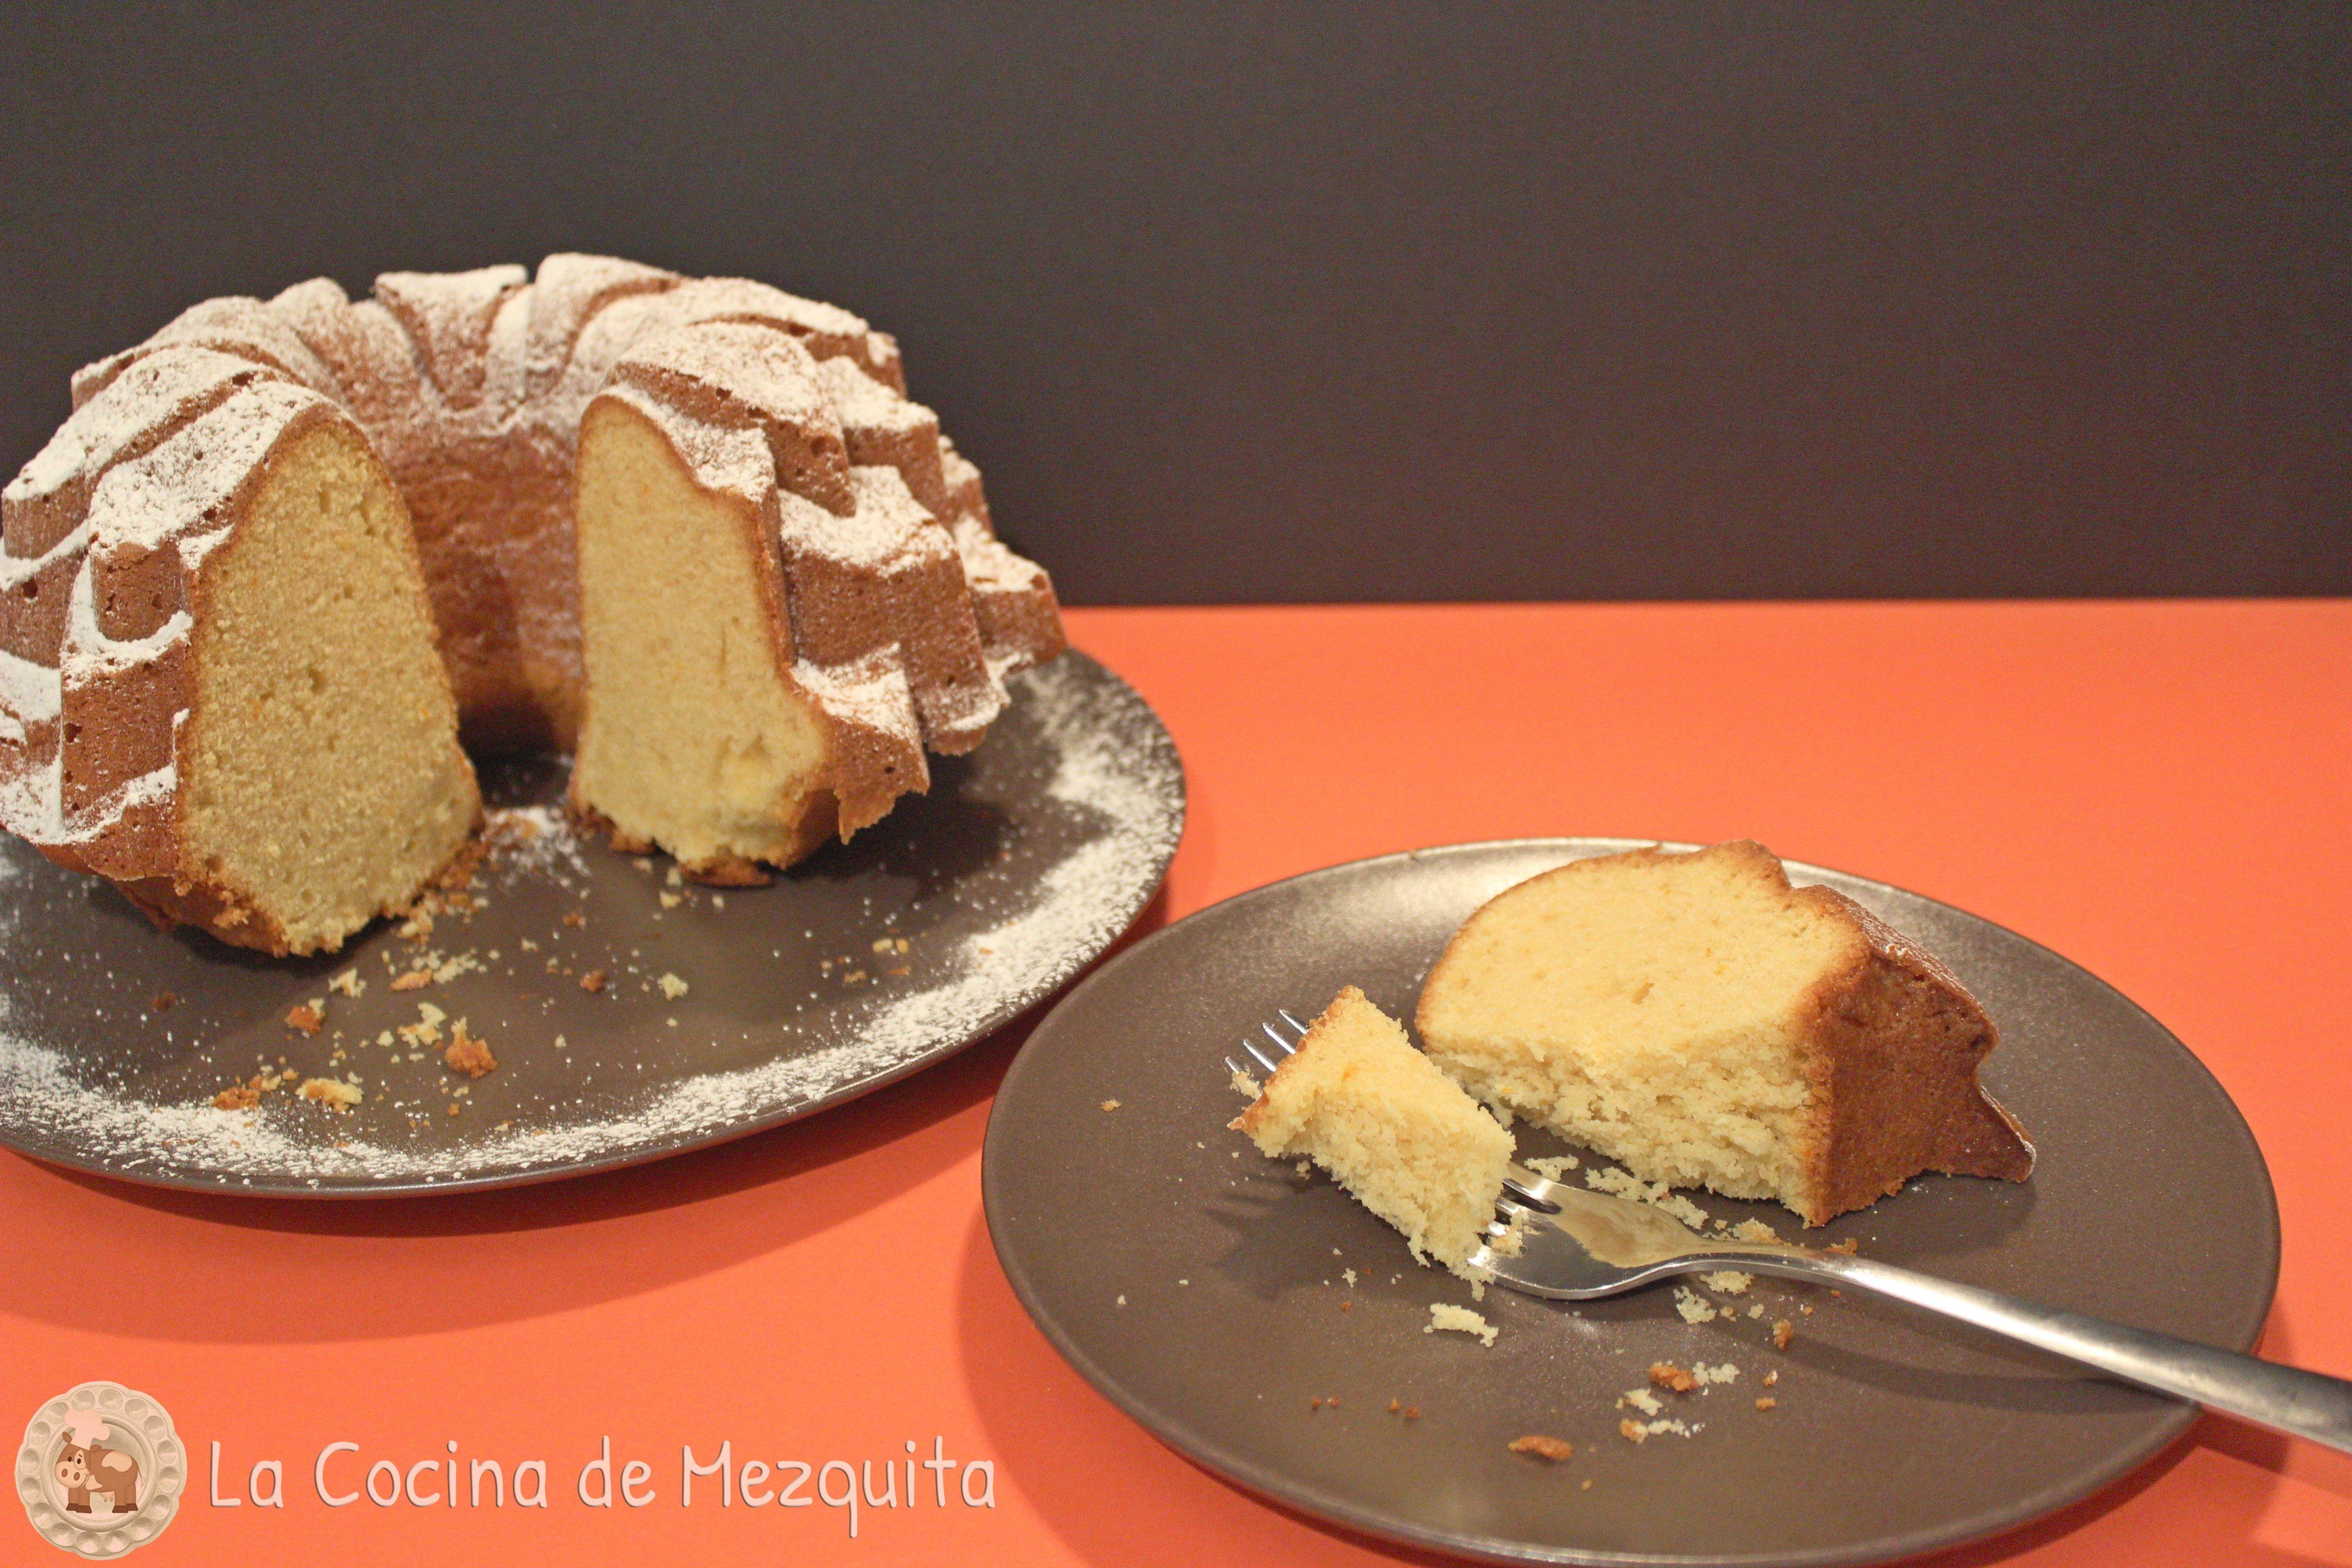 La Cocina De Mezquita Blog De Recetas Cocinamezquita Perfil Pinterest